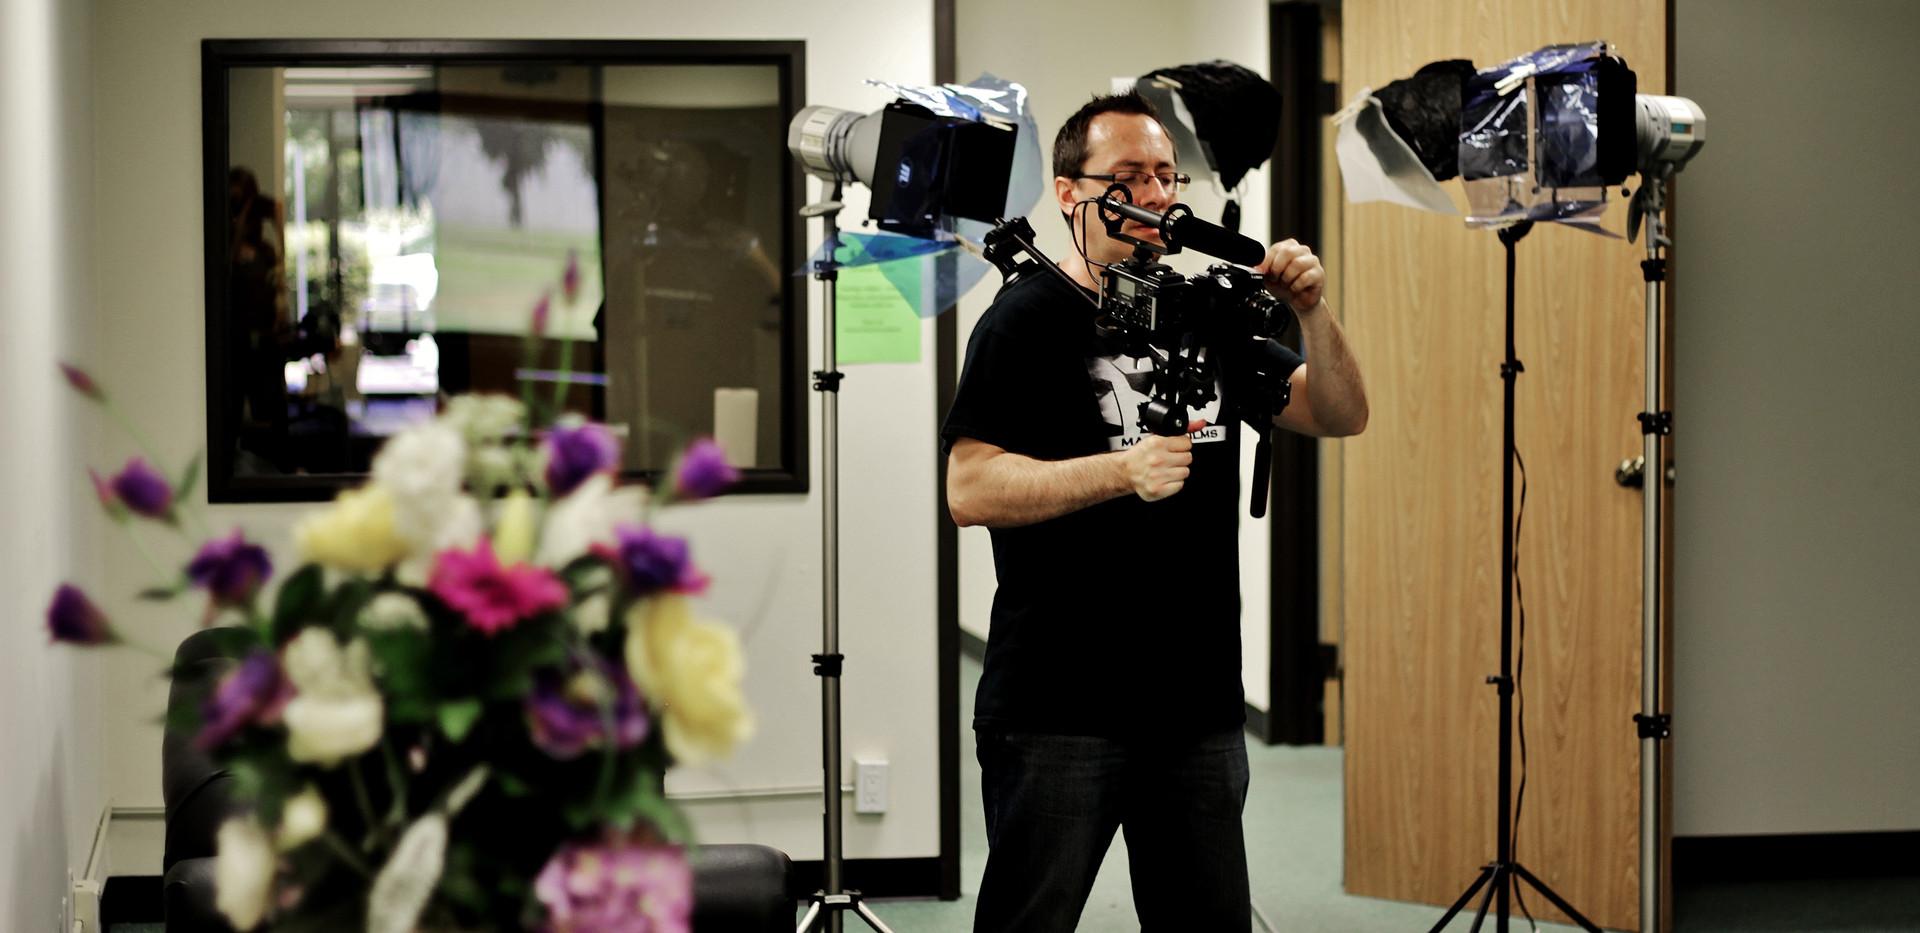 Director Shane Cole